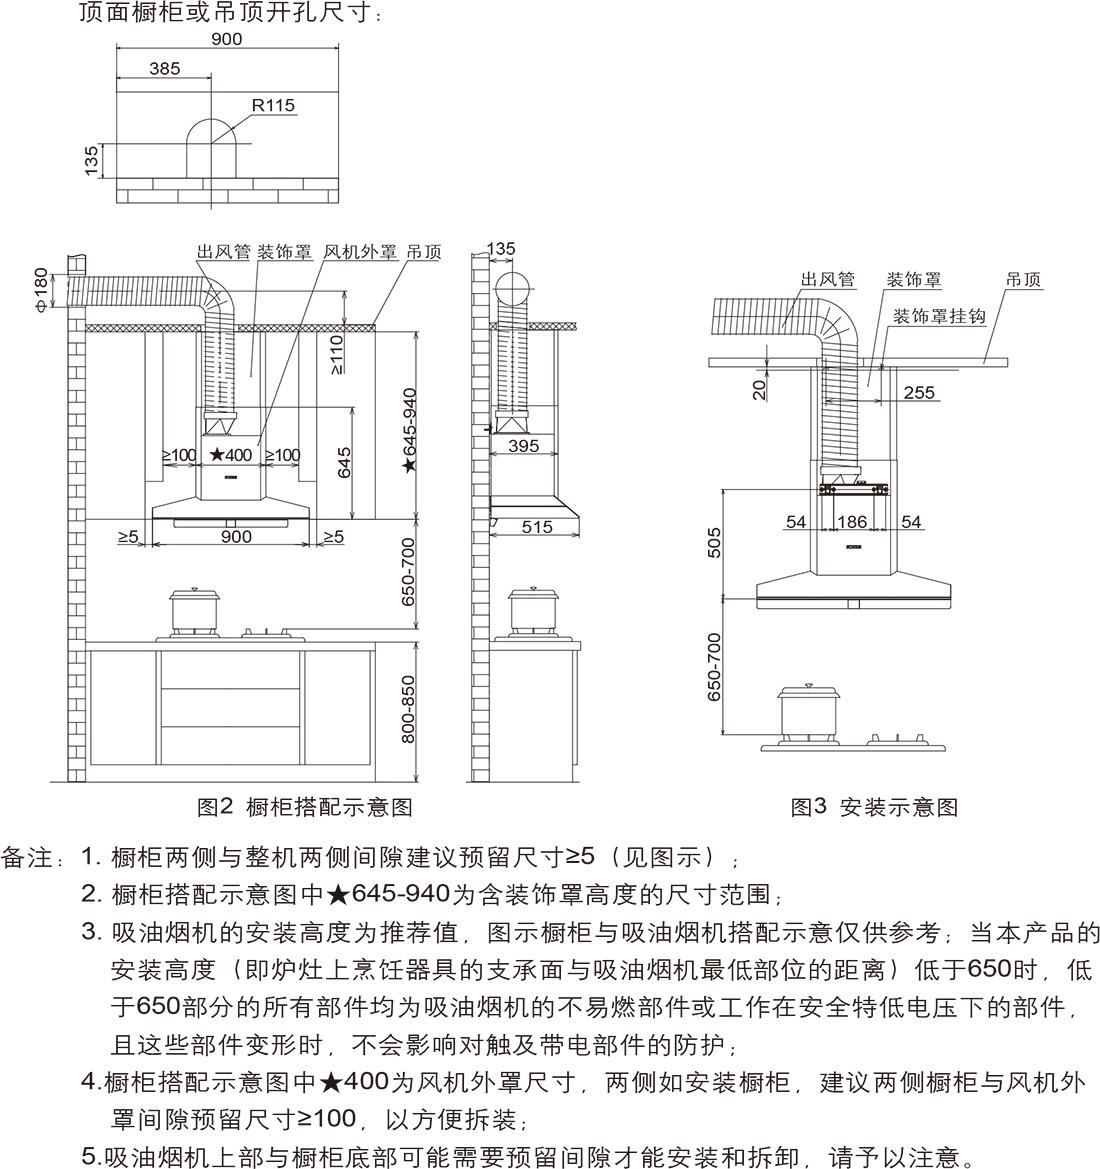 bbin体育开户CXW-258-EM7T.S安装示意图